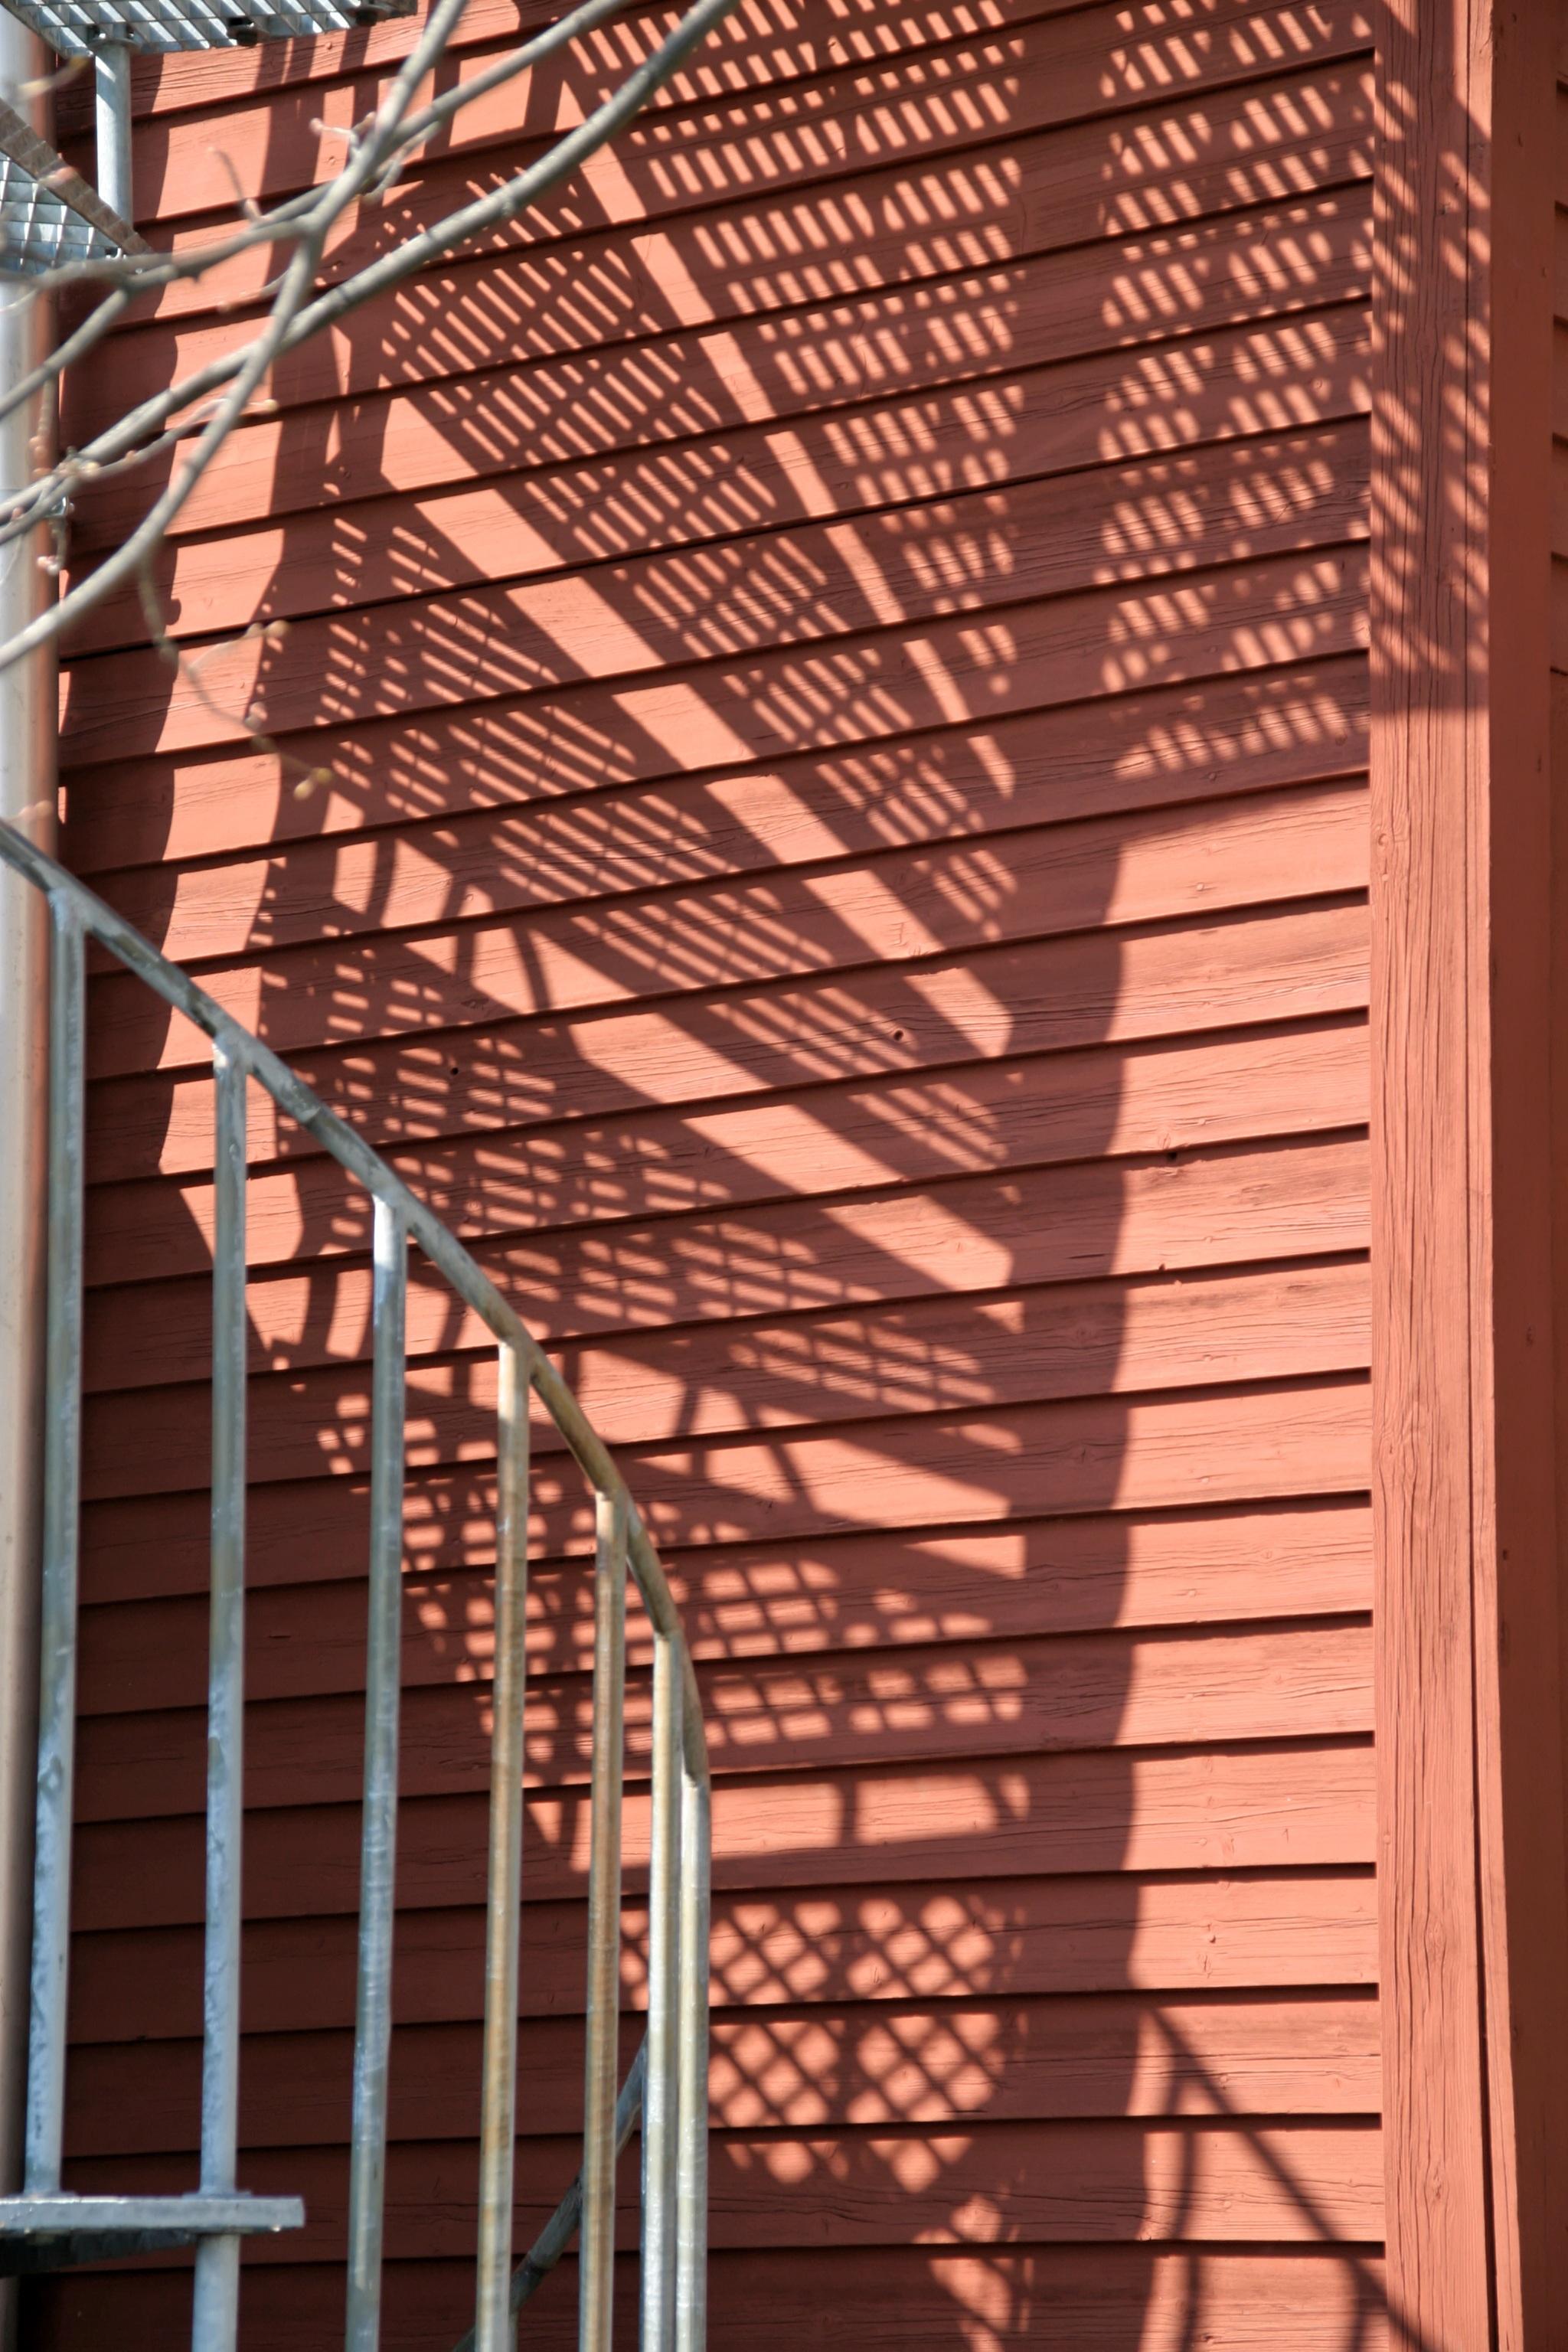 Fotos Gratis Ligero Arquitectura Madera Rascacielos Pared  ~ Barandas De Hierro Para Escaleras Interiores